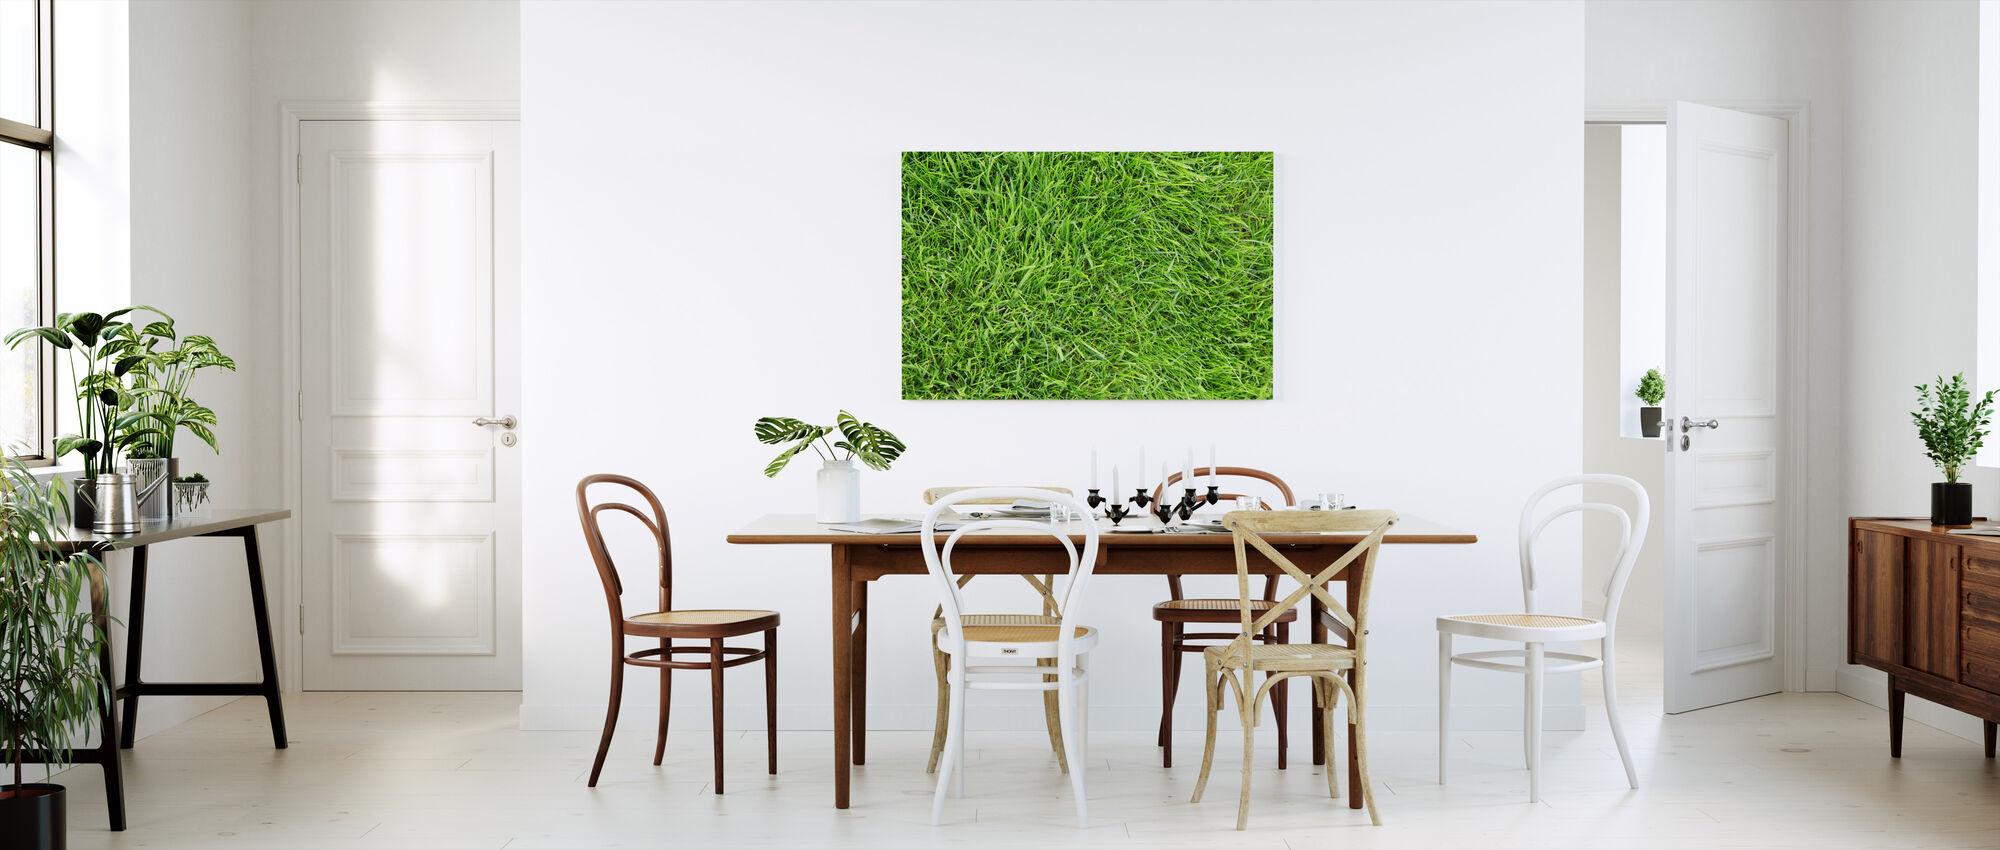 Fresh Green Grass - Canvas print - Kitchen